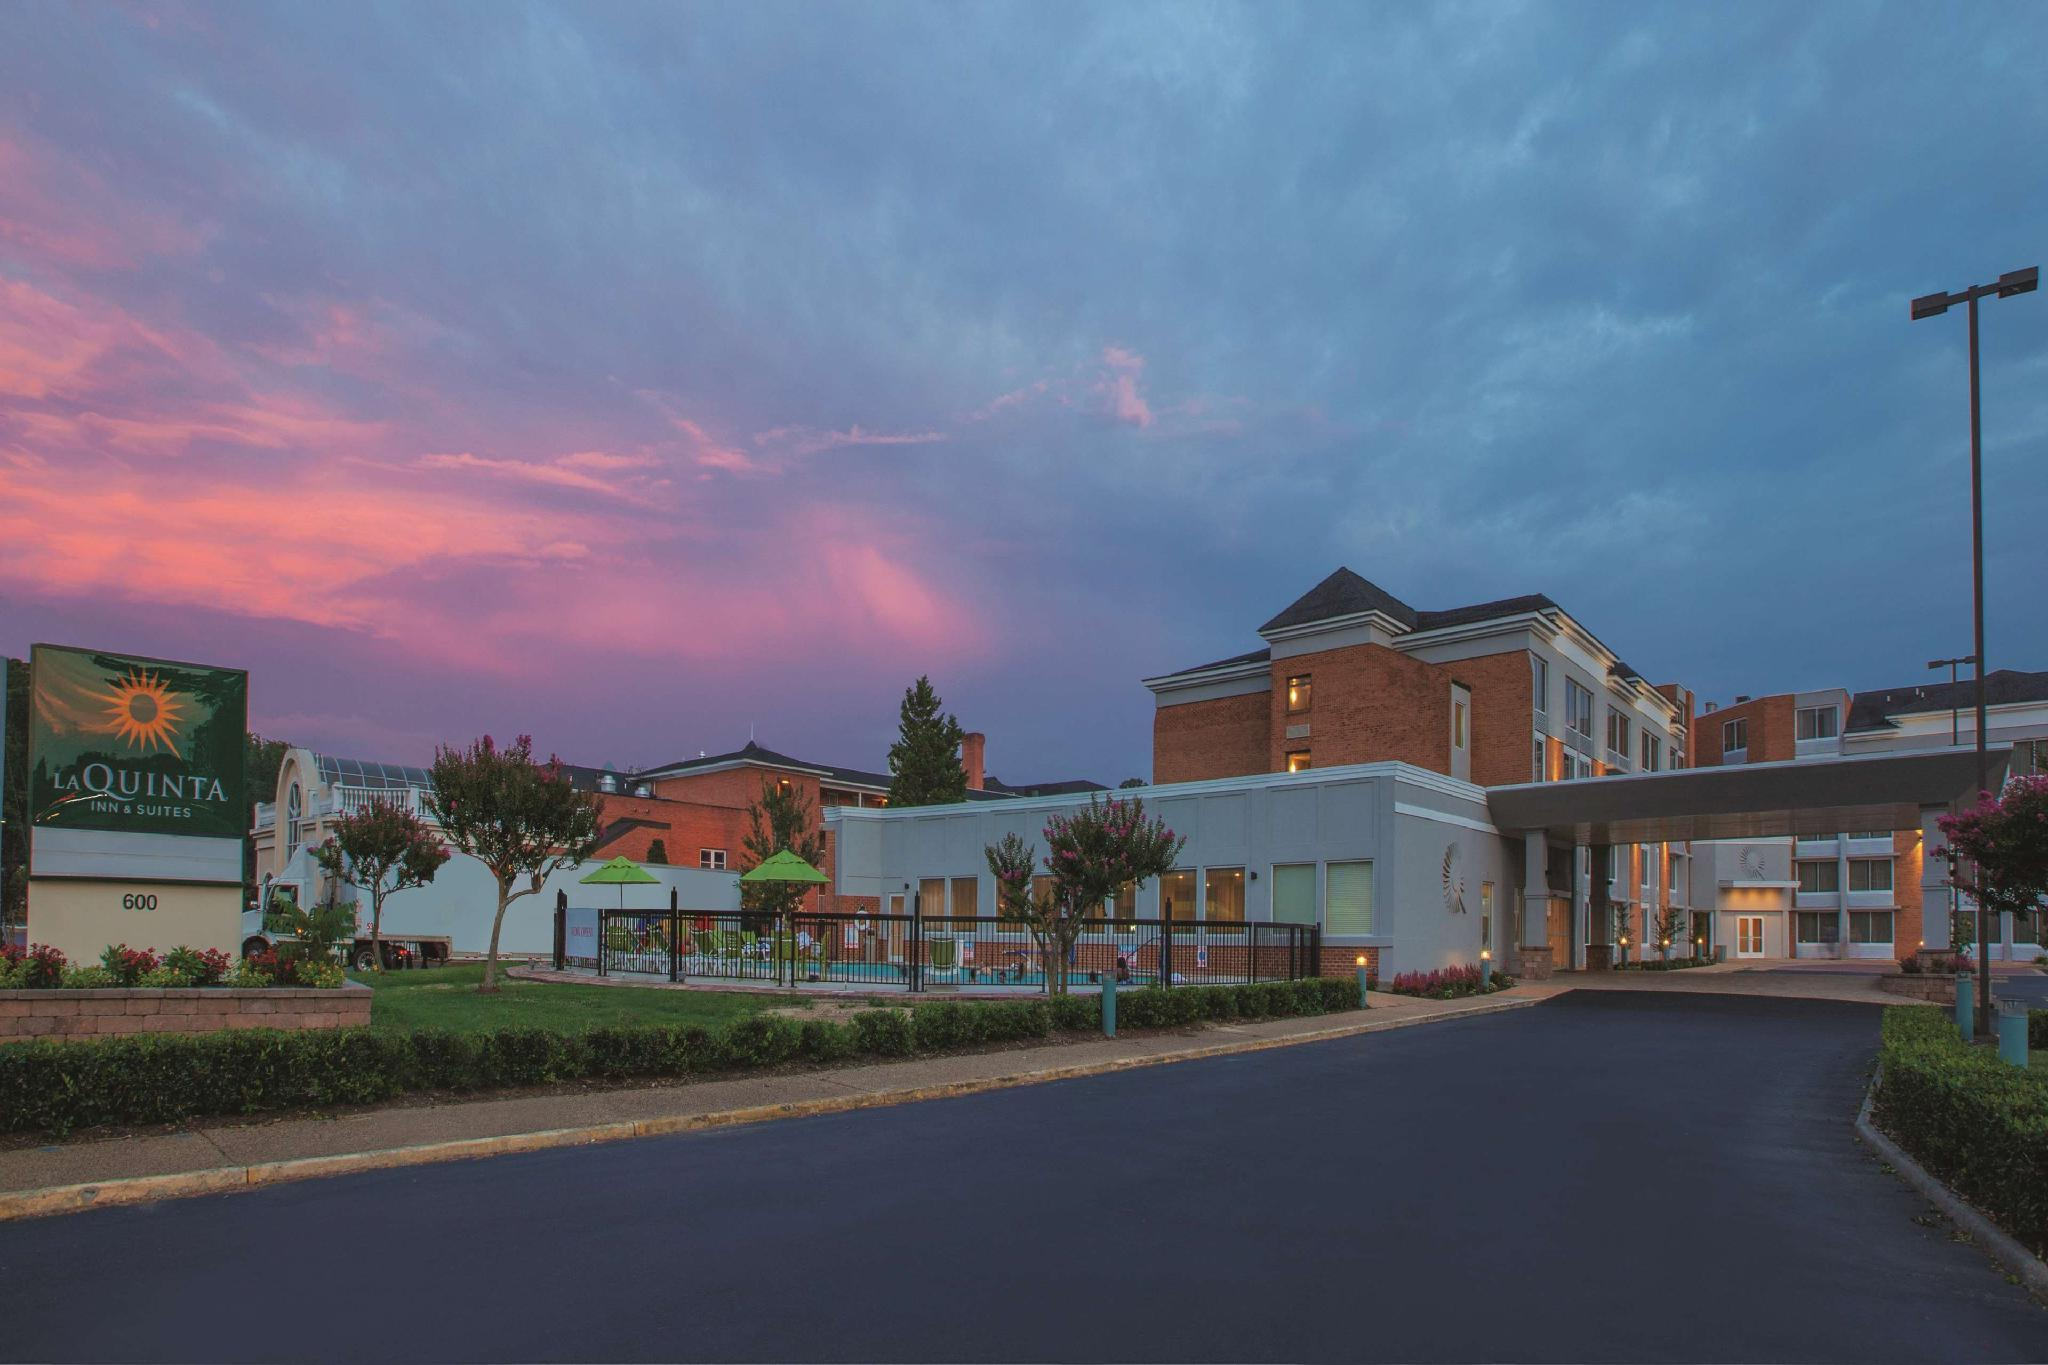 La Quinta Inn And Suites By Wyndham Williamsburg Historic Area